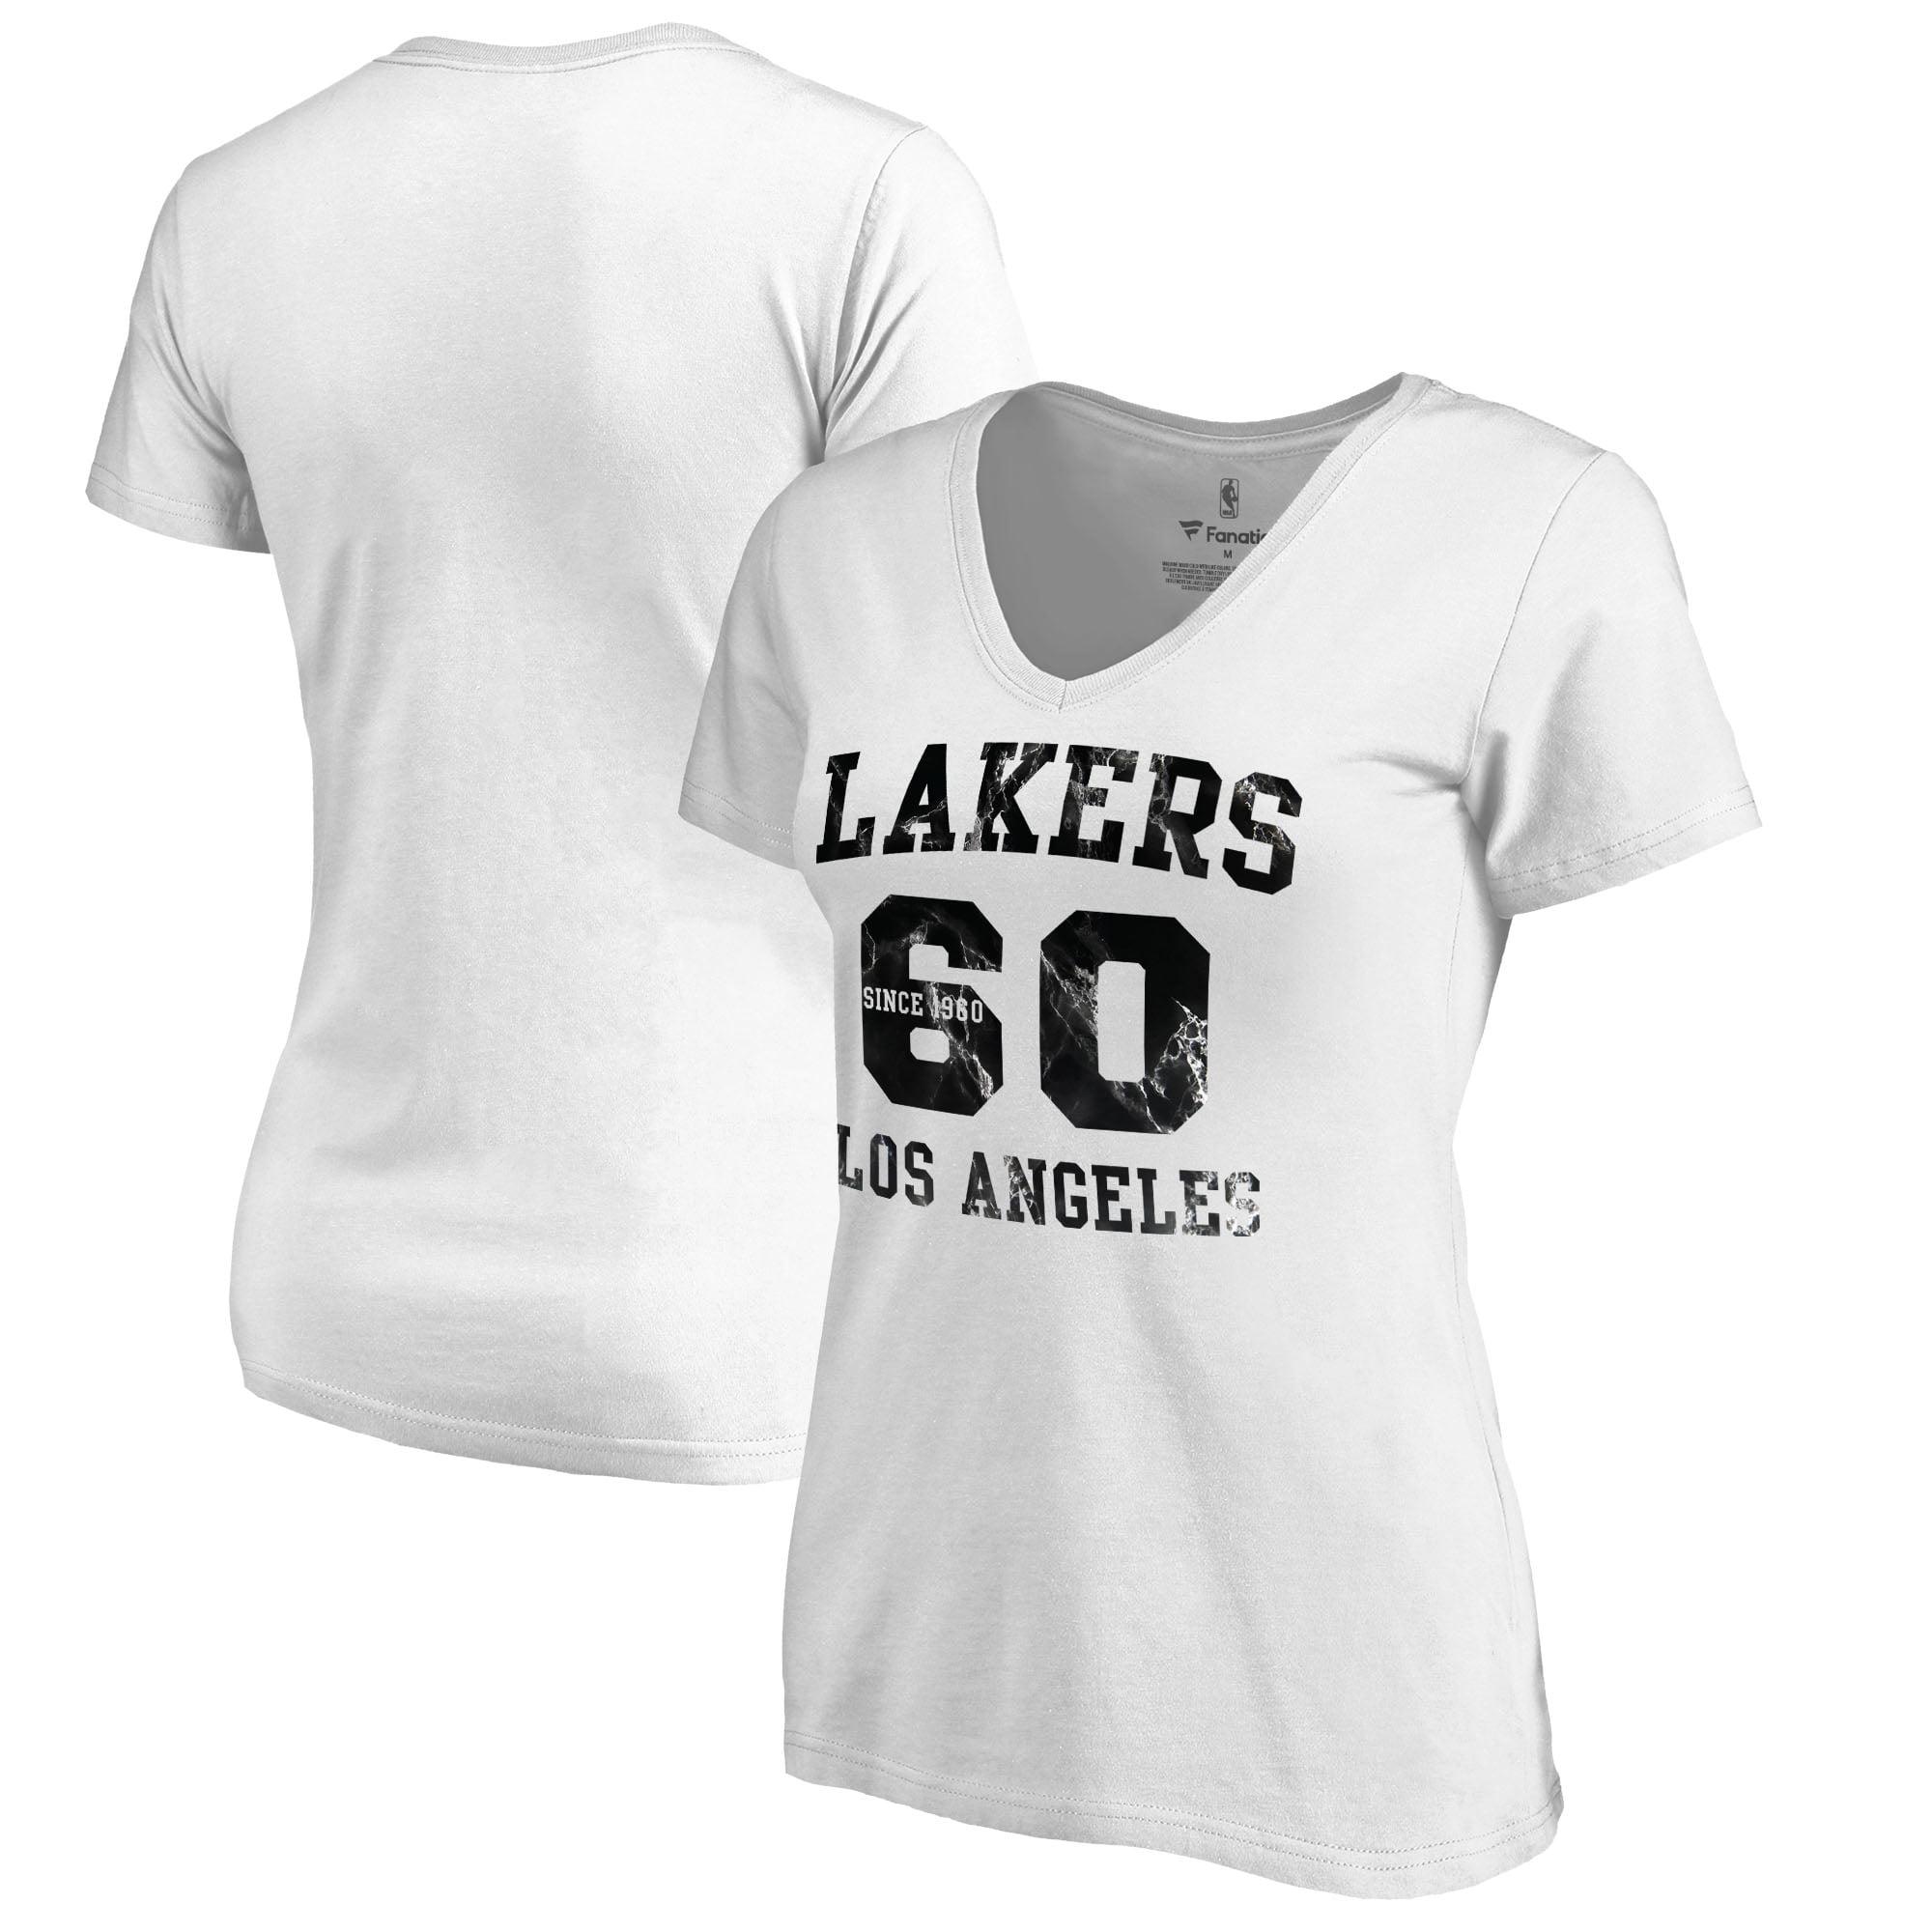 Los Angeles Lakers Fanatics Branded Women's Hang Time Plus Size V-Neck T-Shirt - White